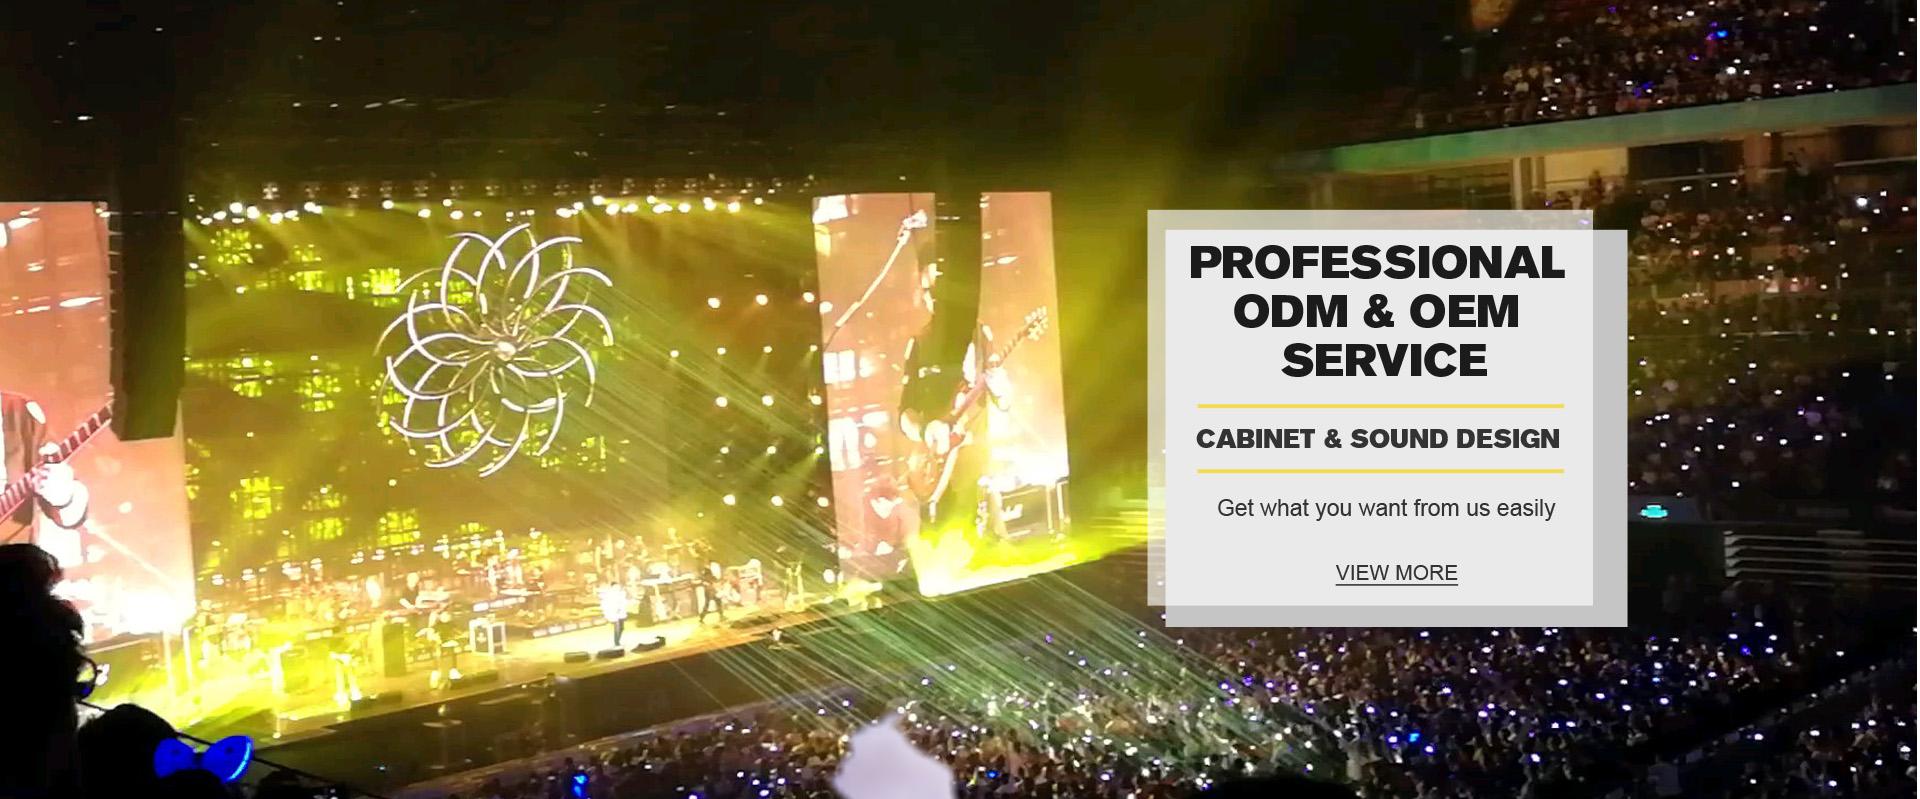 Professional ODM & OEM Service